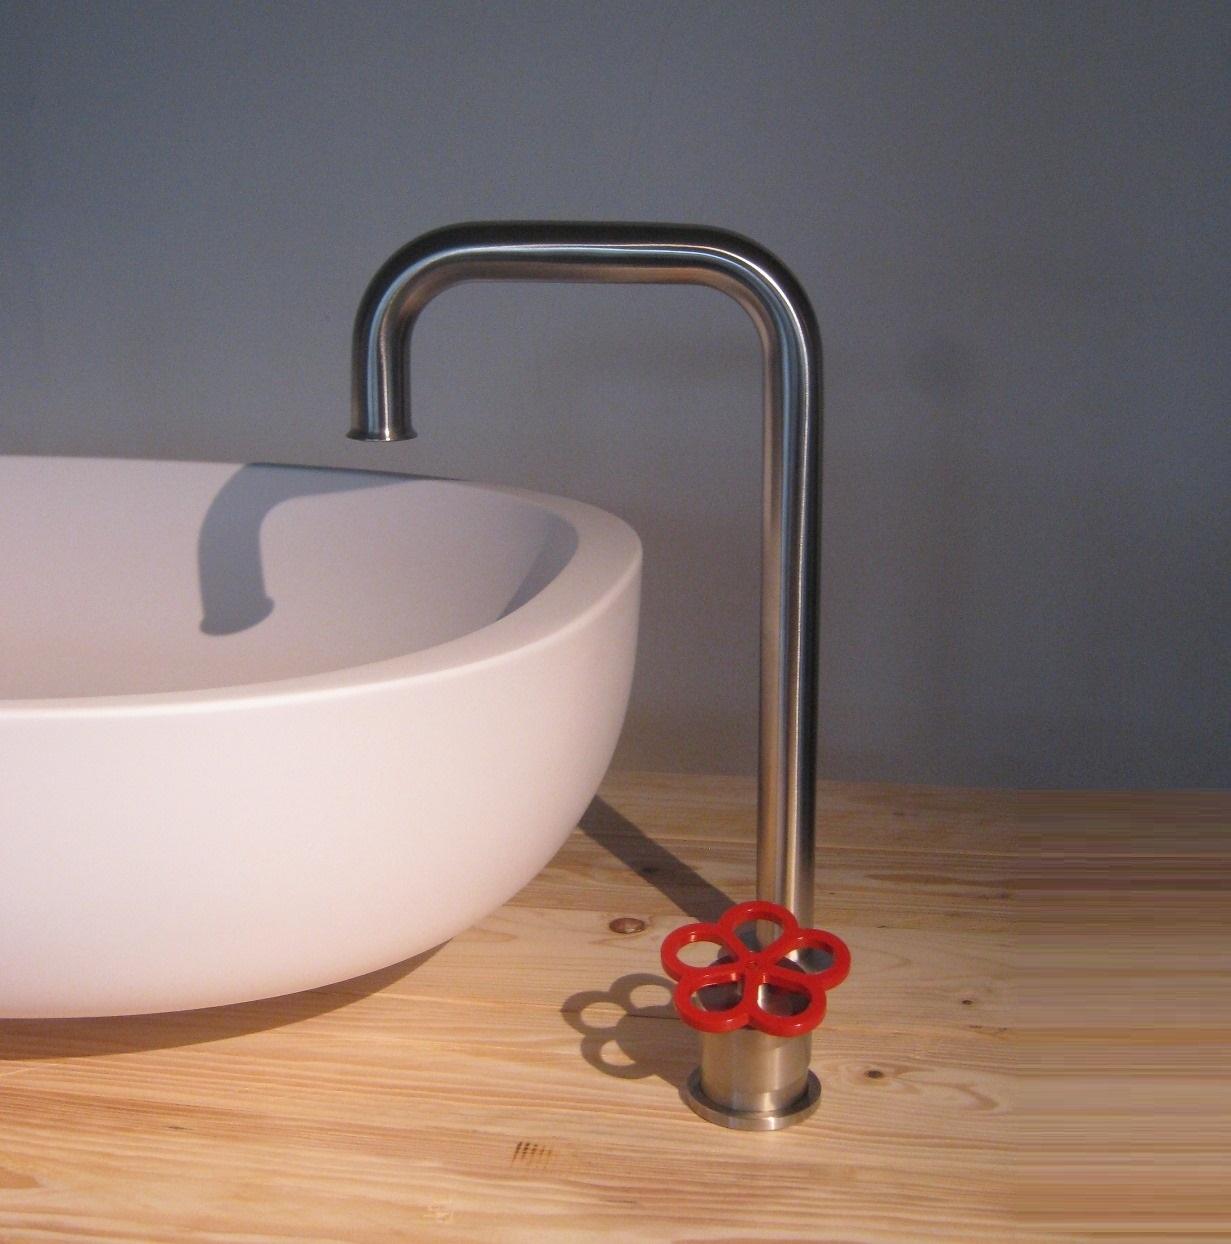 boffi miscelatore pipe con lavabo iceland, boffi bathroom design ... - Boffi Arredo Bagno